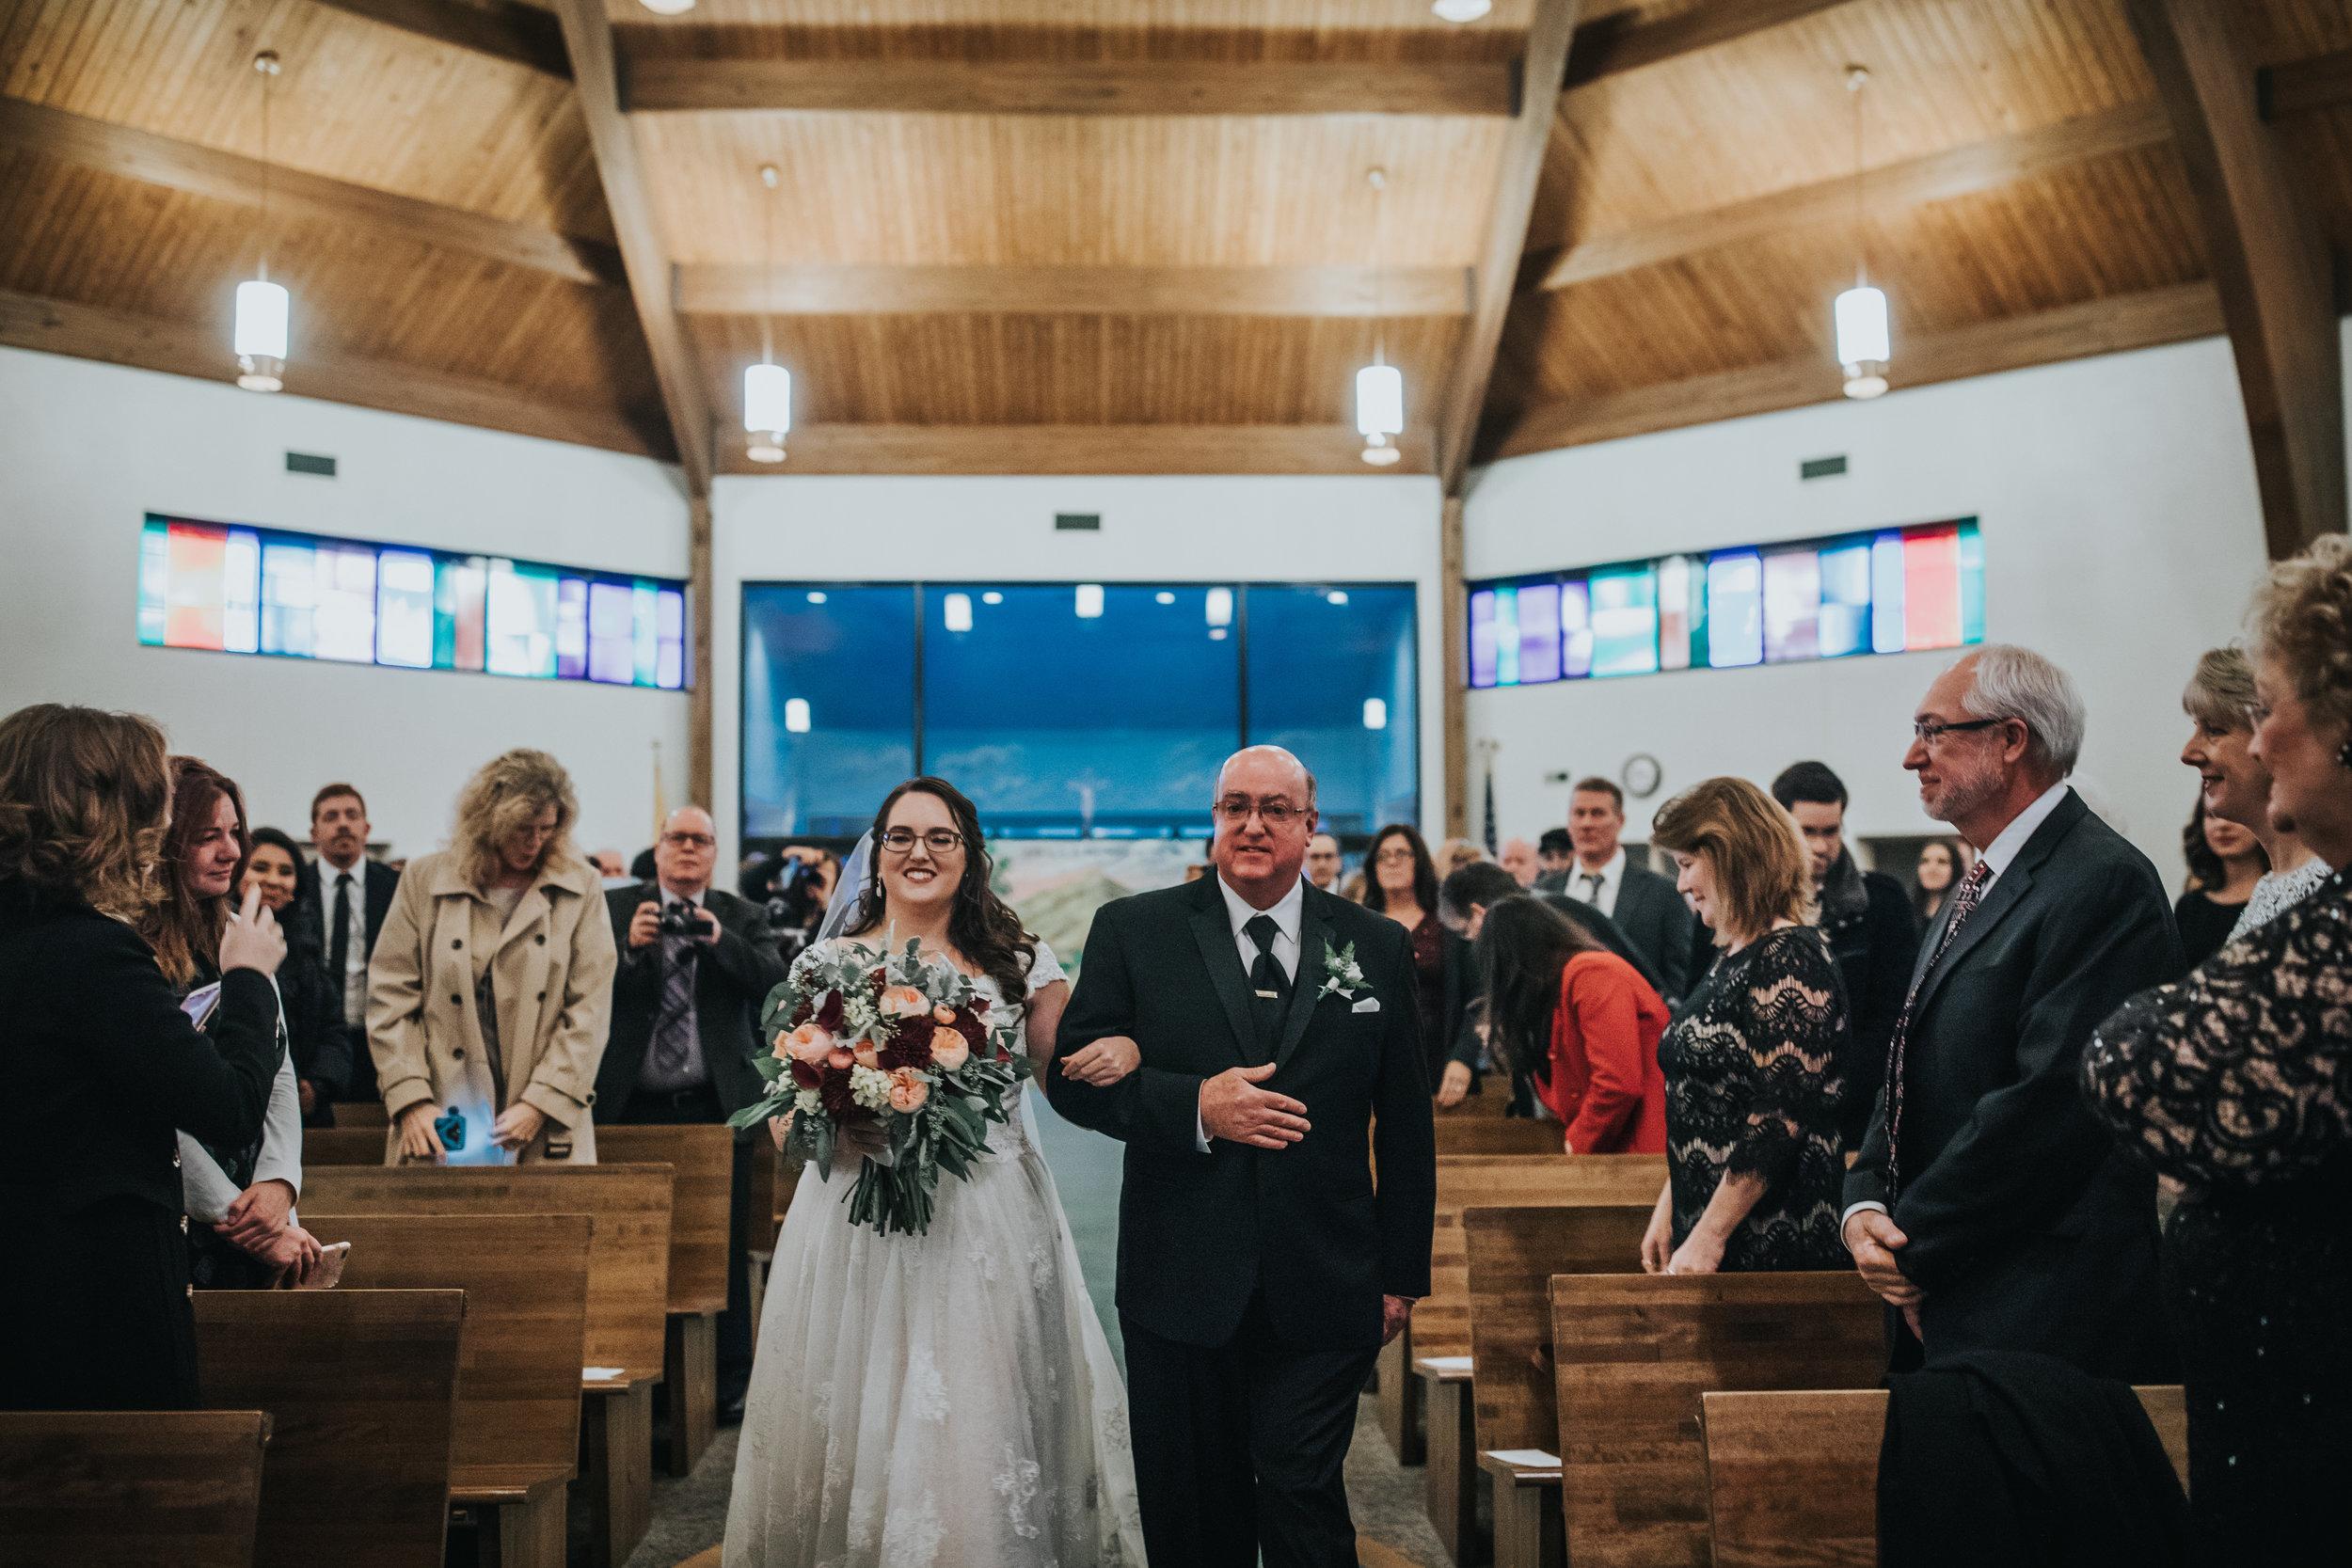 New-Jersey-Wedding-Photography-Fishers-Tudor-House-JennaLynnPhotography-Ceremony-Kathleen&Eddie-17.jpg